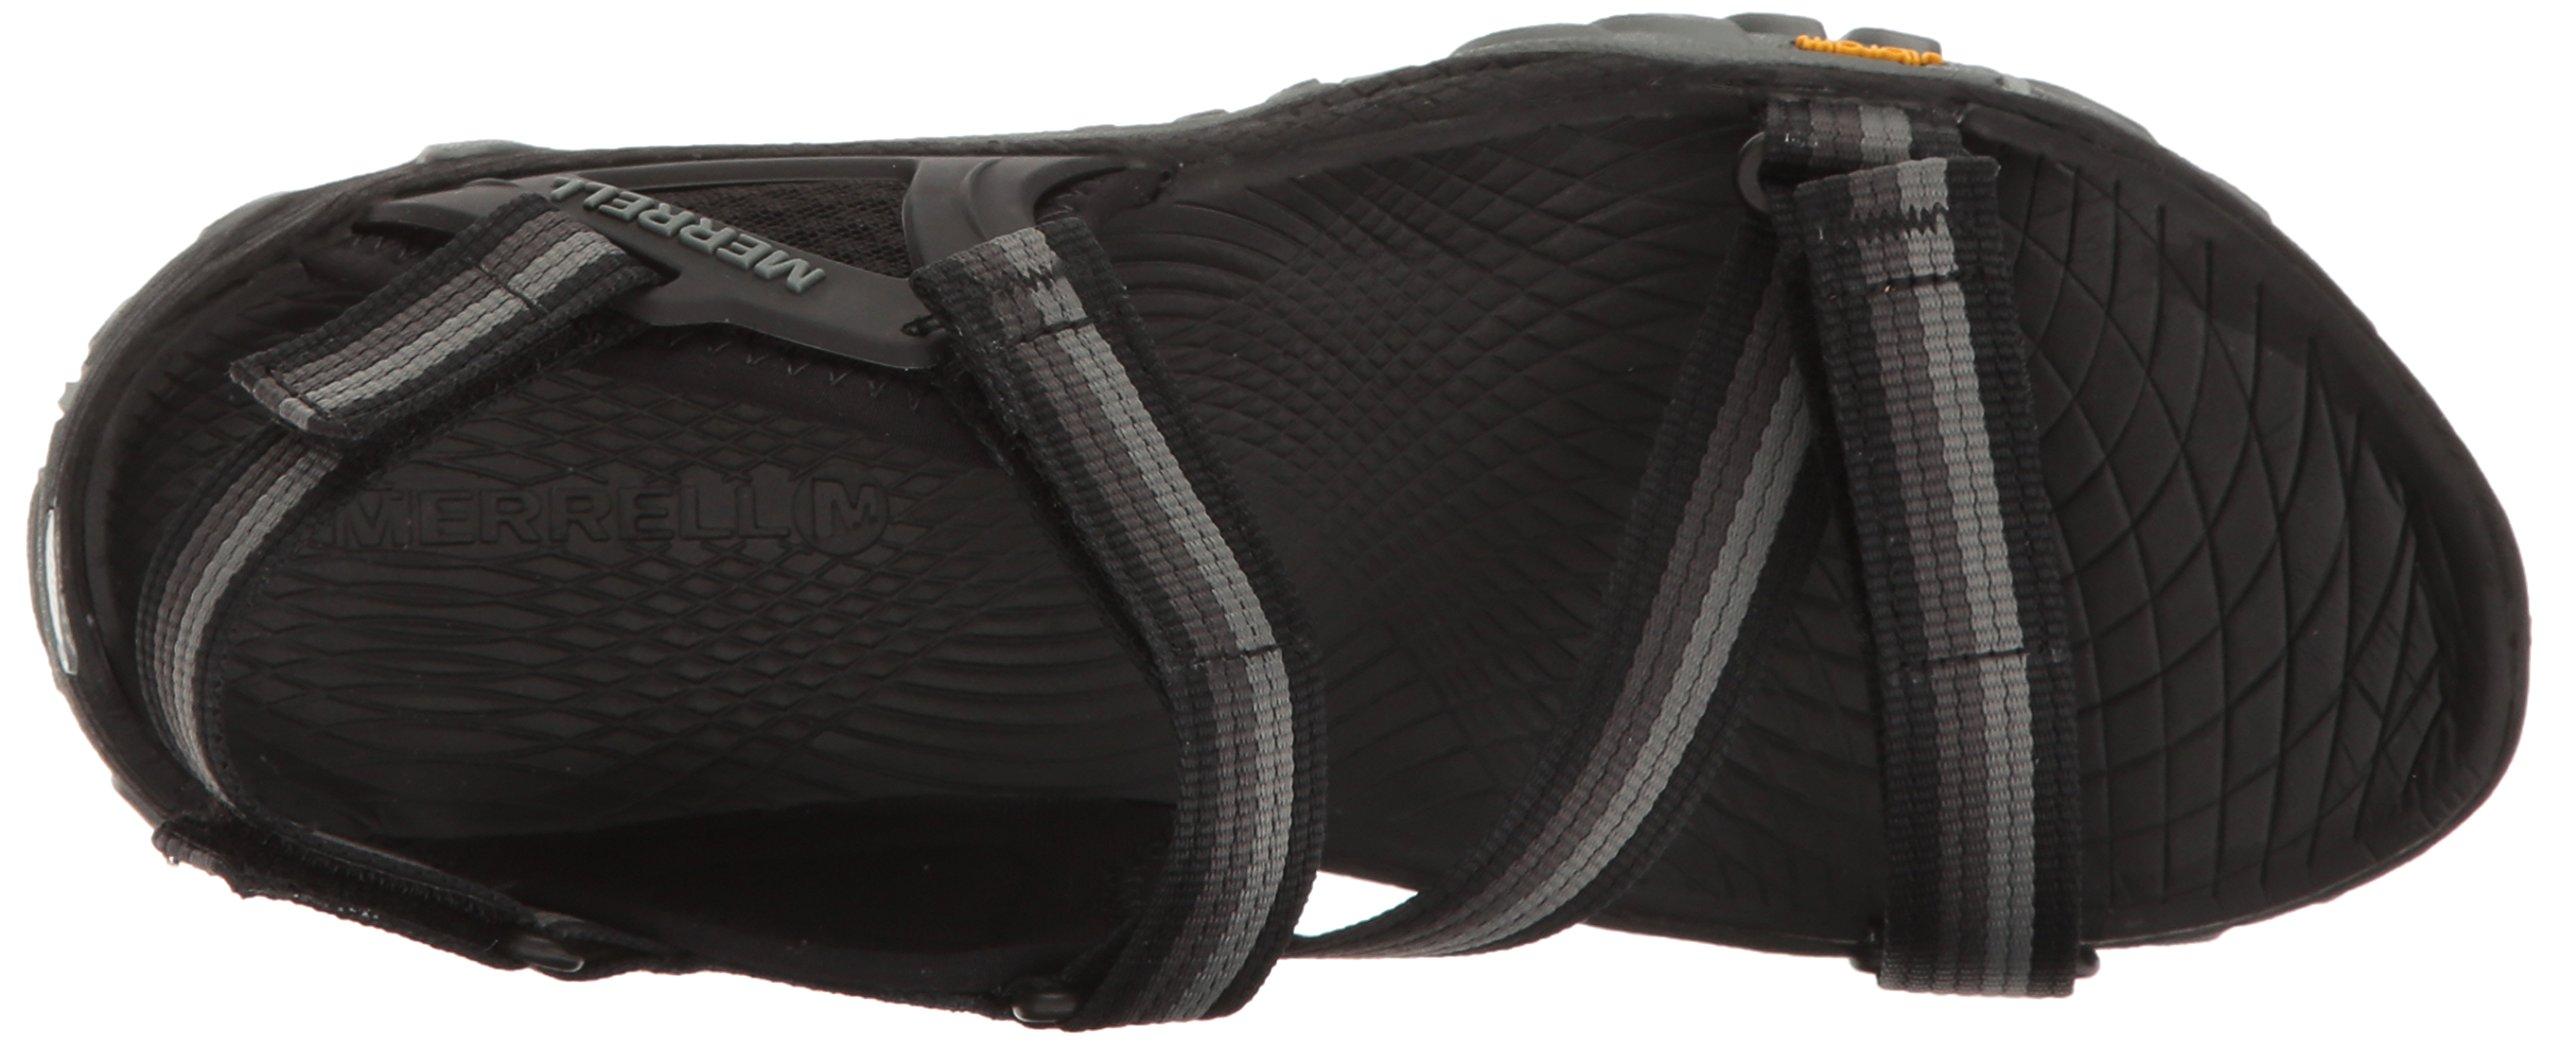 Merrell Women's All Out Blaze Web Sandal, Black, 9 M US by Merrell (Image #8)